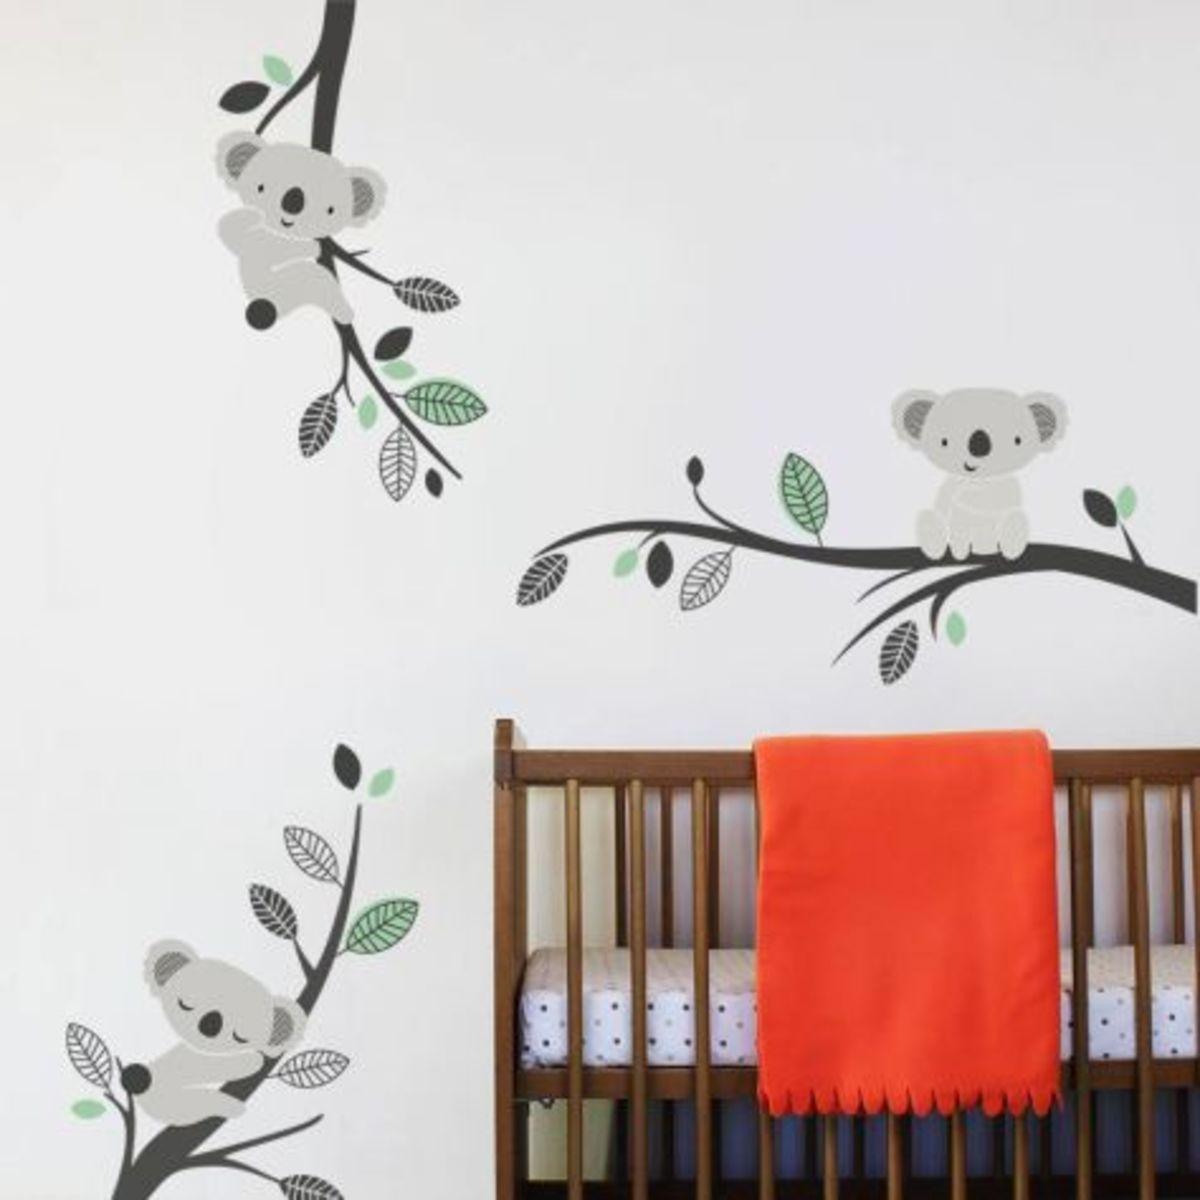 Housedecor koala 30916-0, 88x63